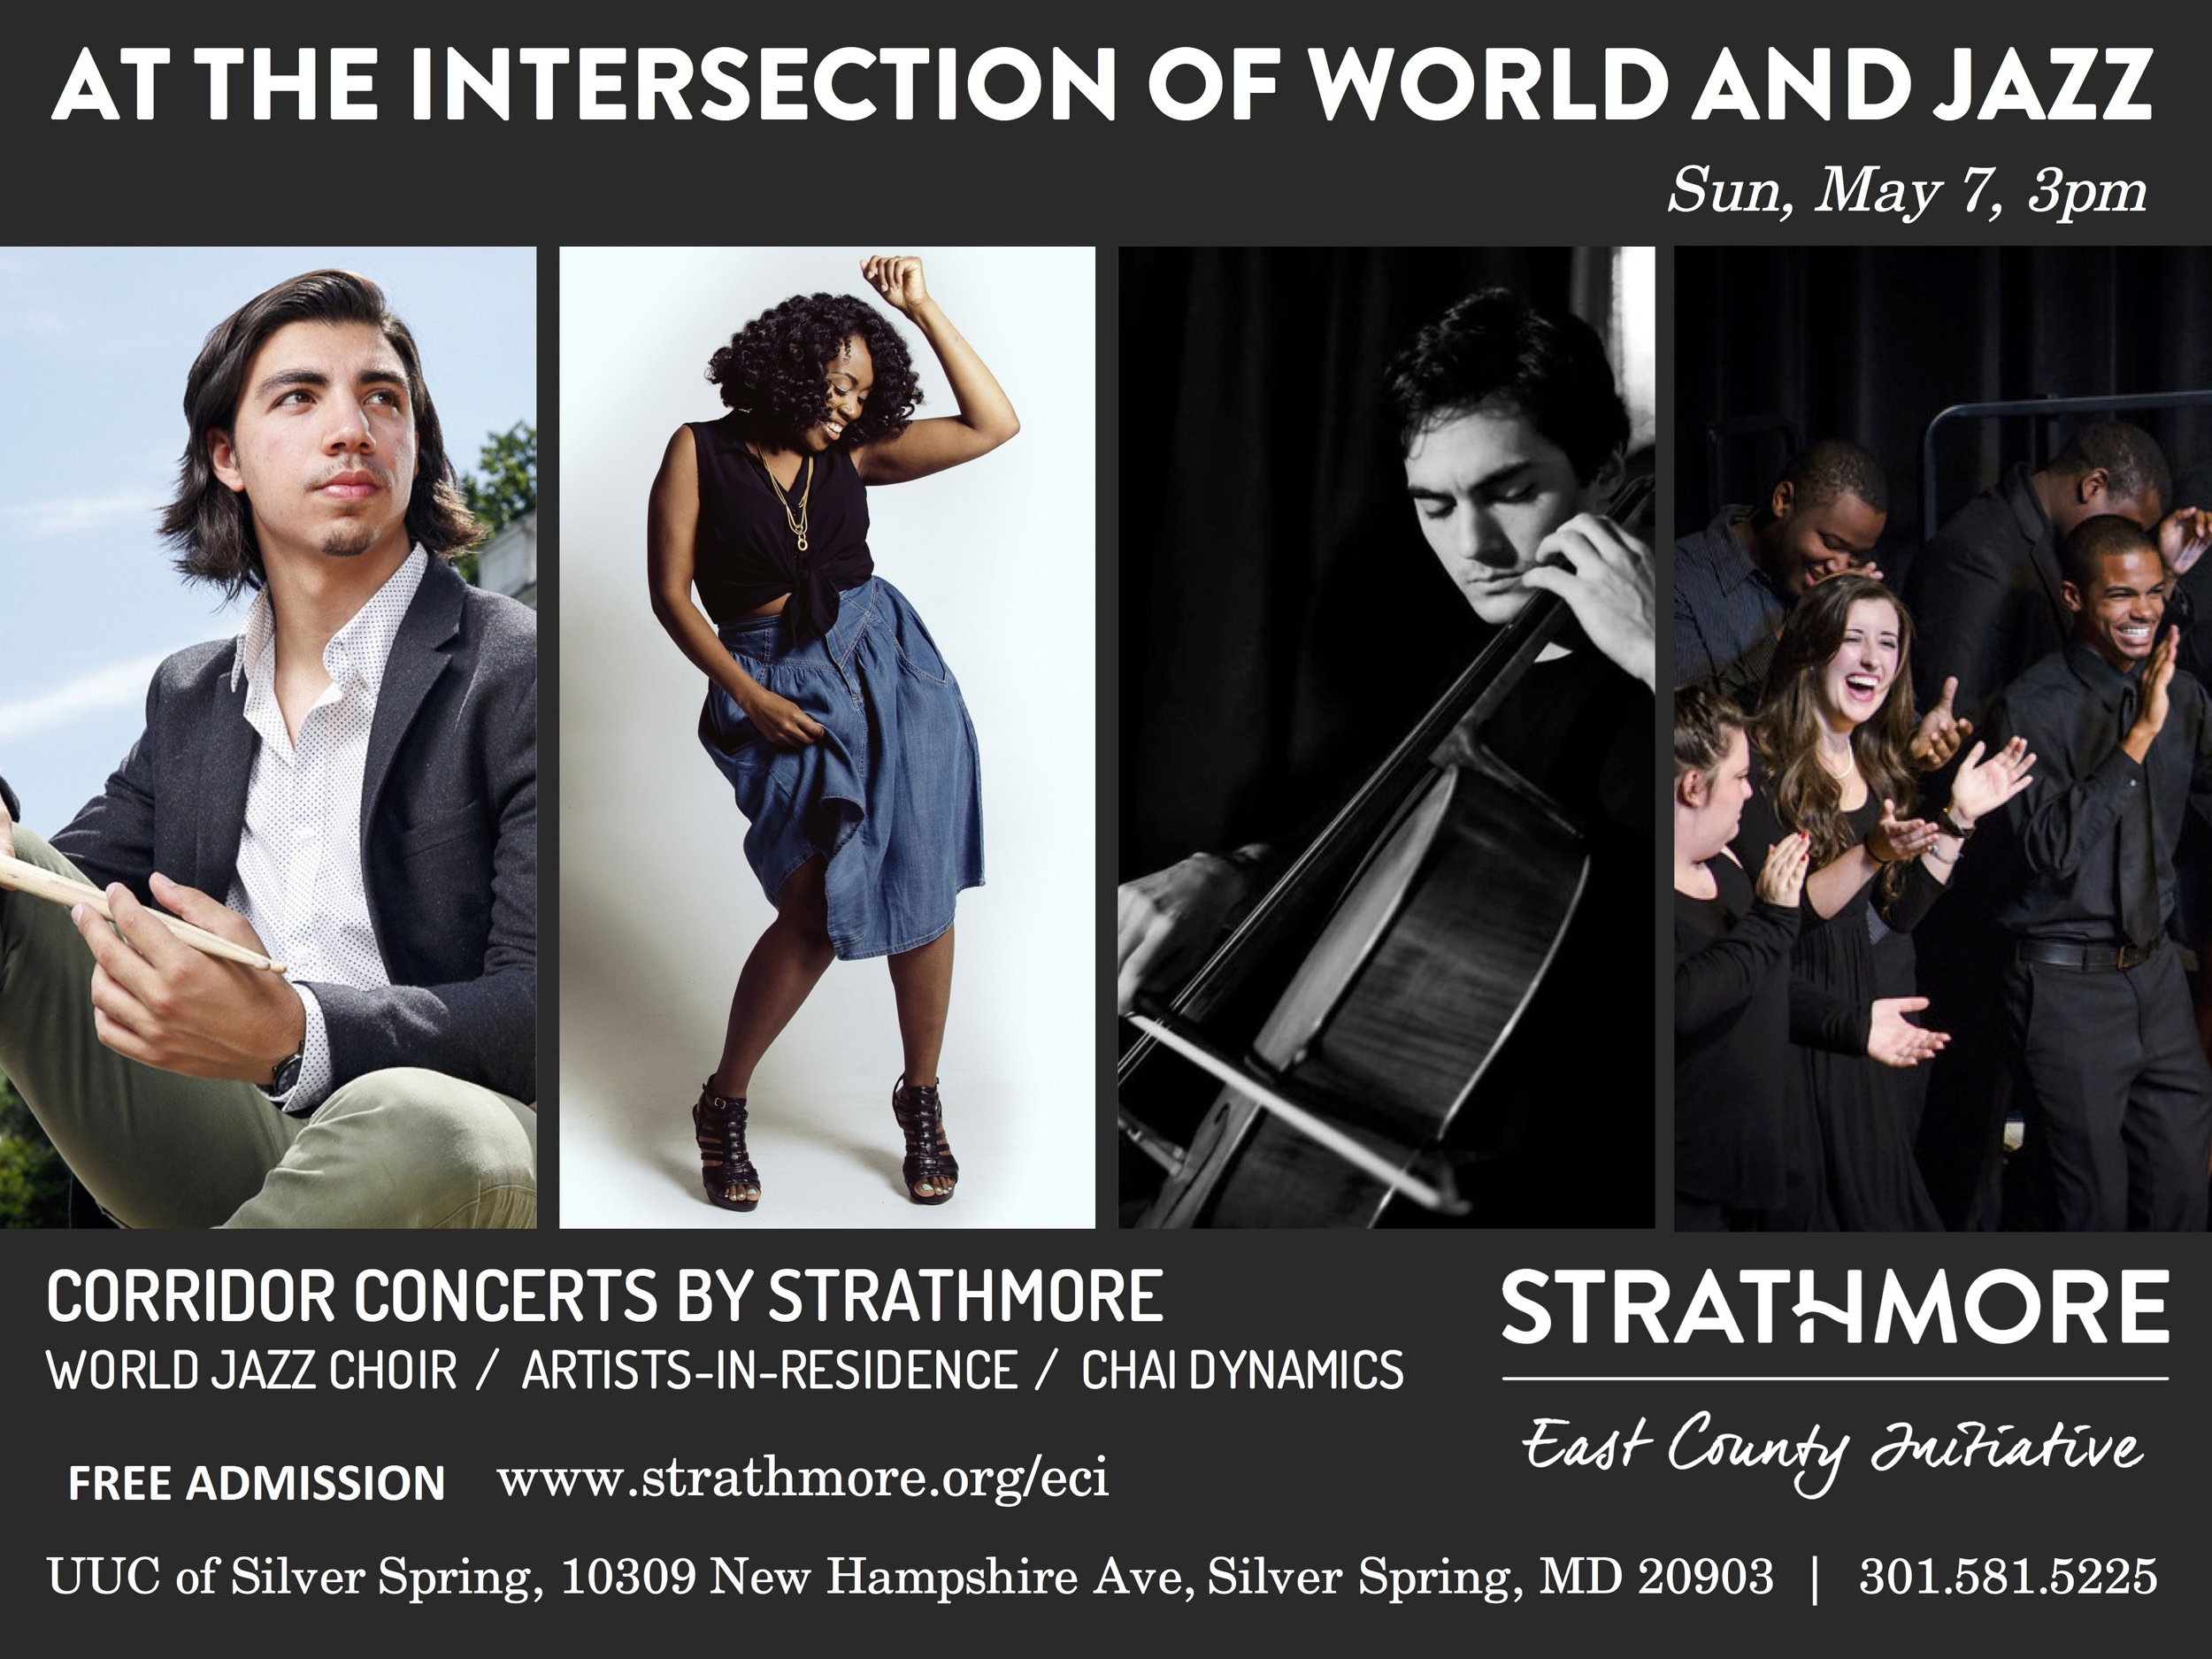 Strathmore Artists